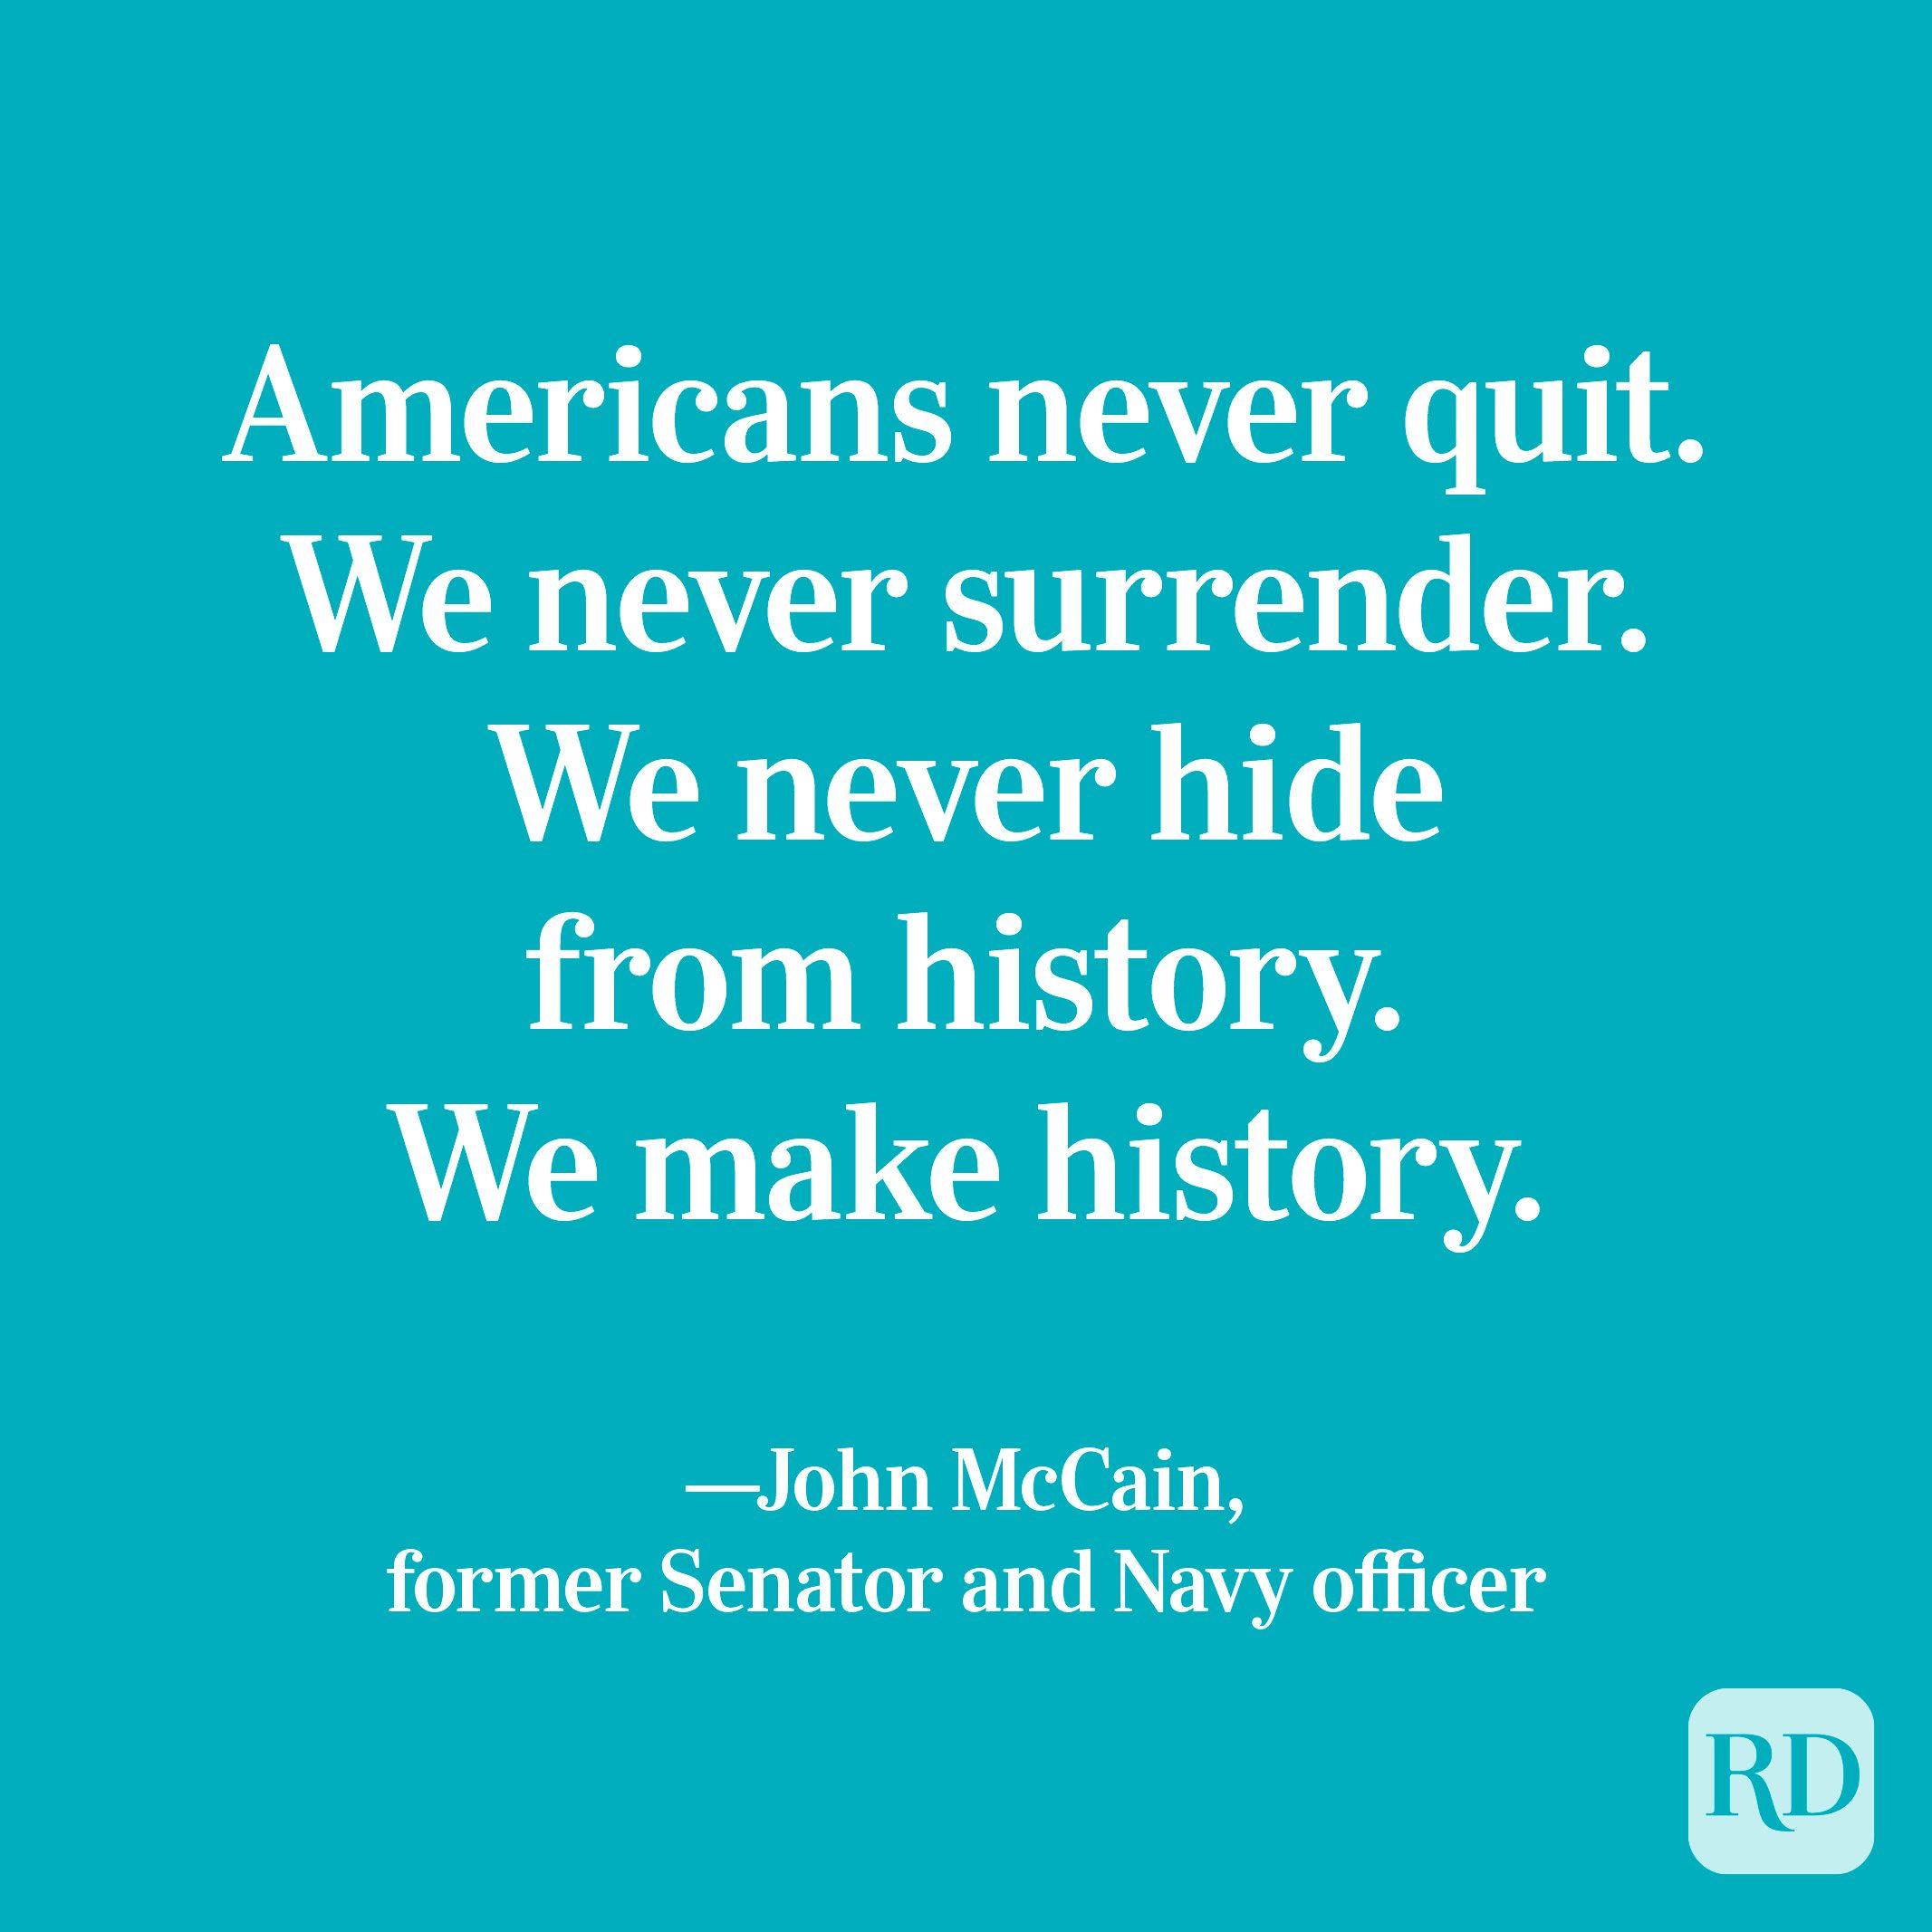 """Americans never quit. We never surrender. We never hide from history. We make history."" —John McCain, former Senator and Navy officer"